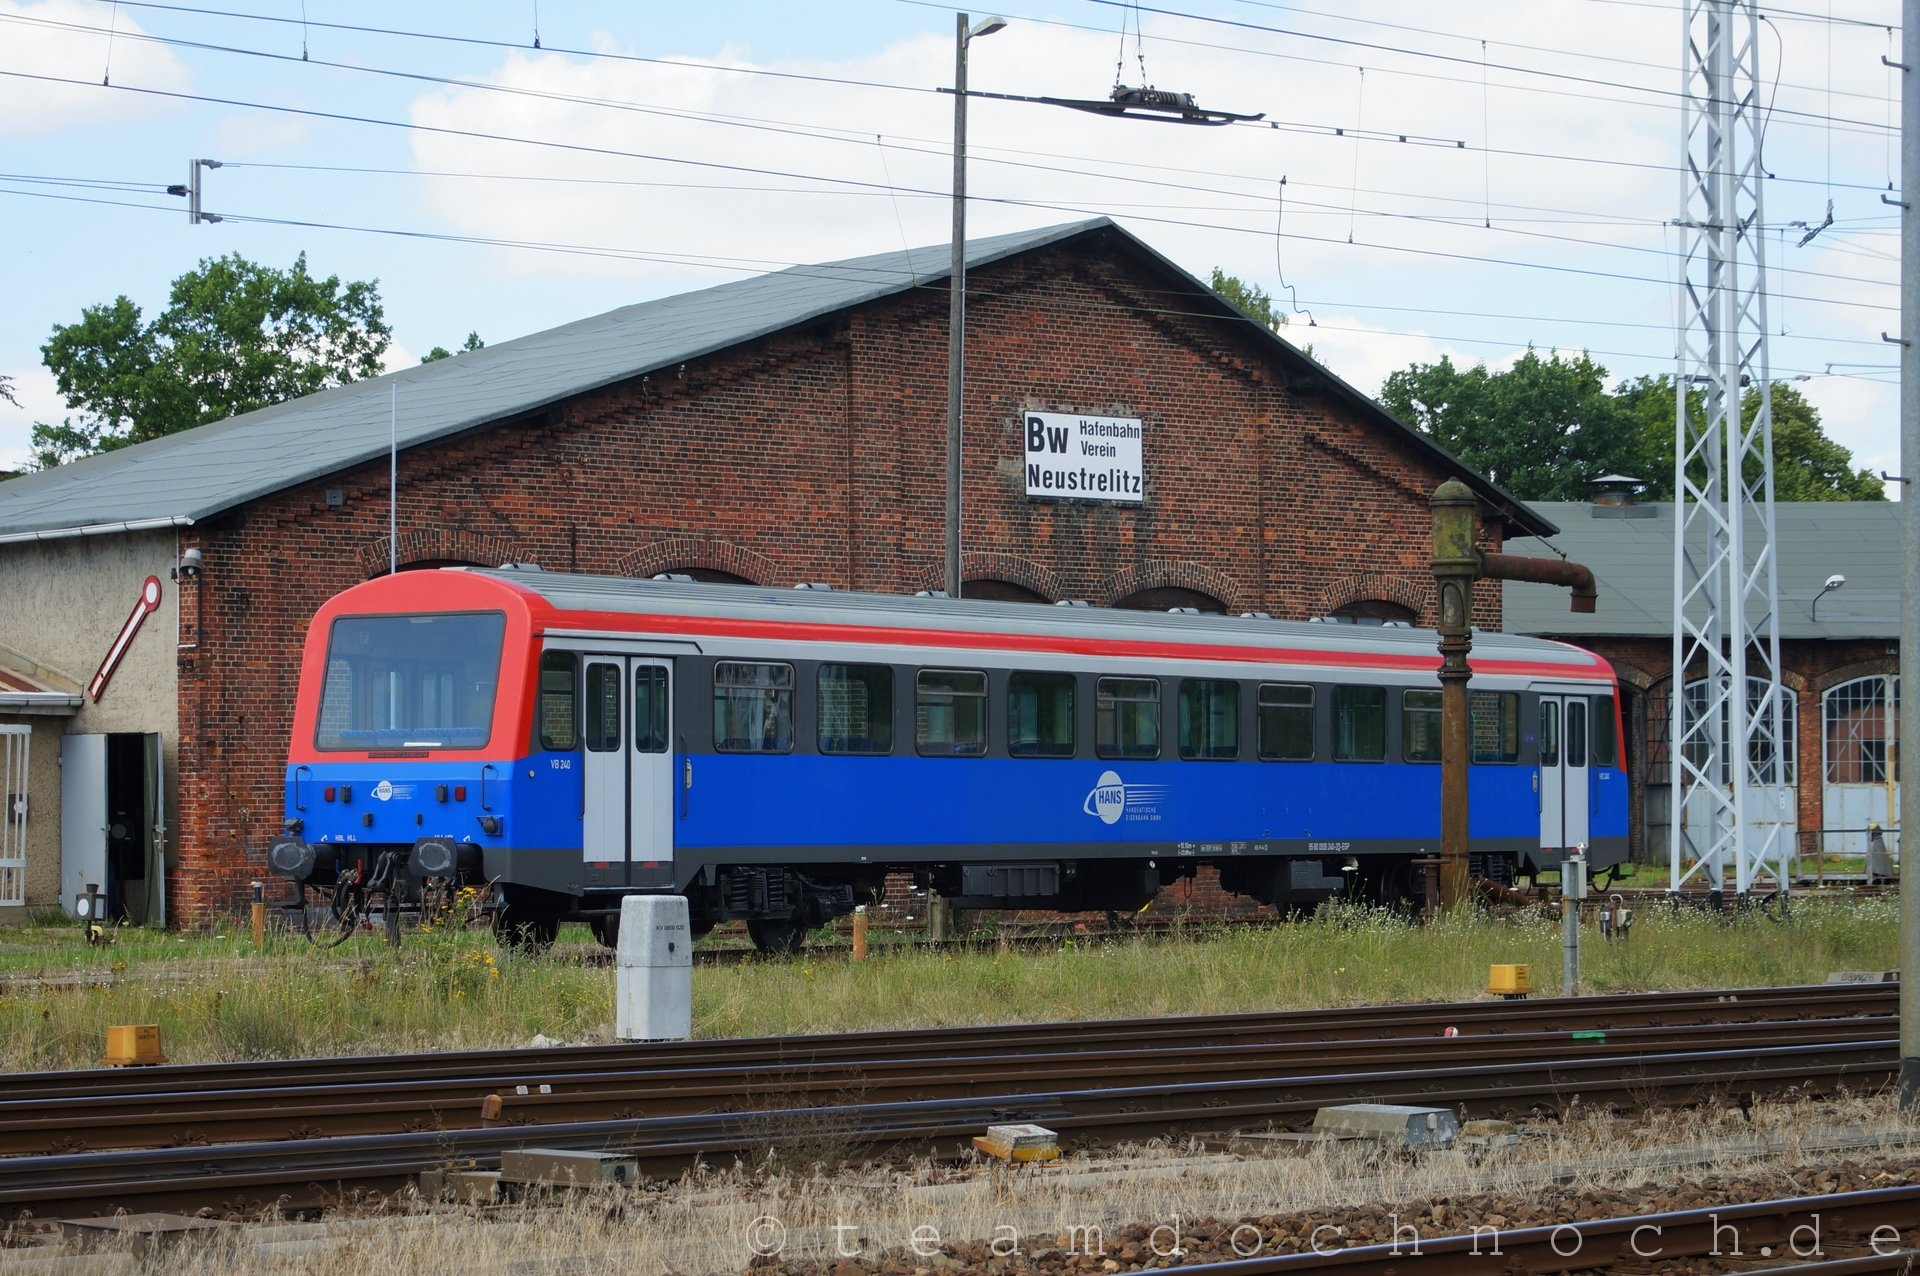 VB 240 der HANS in Neustrelitz